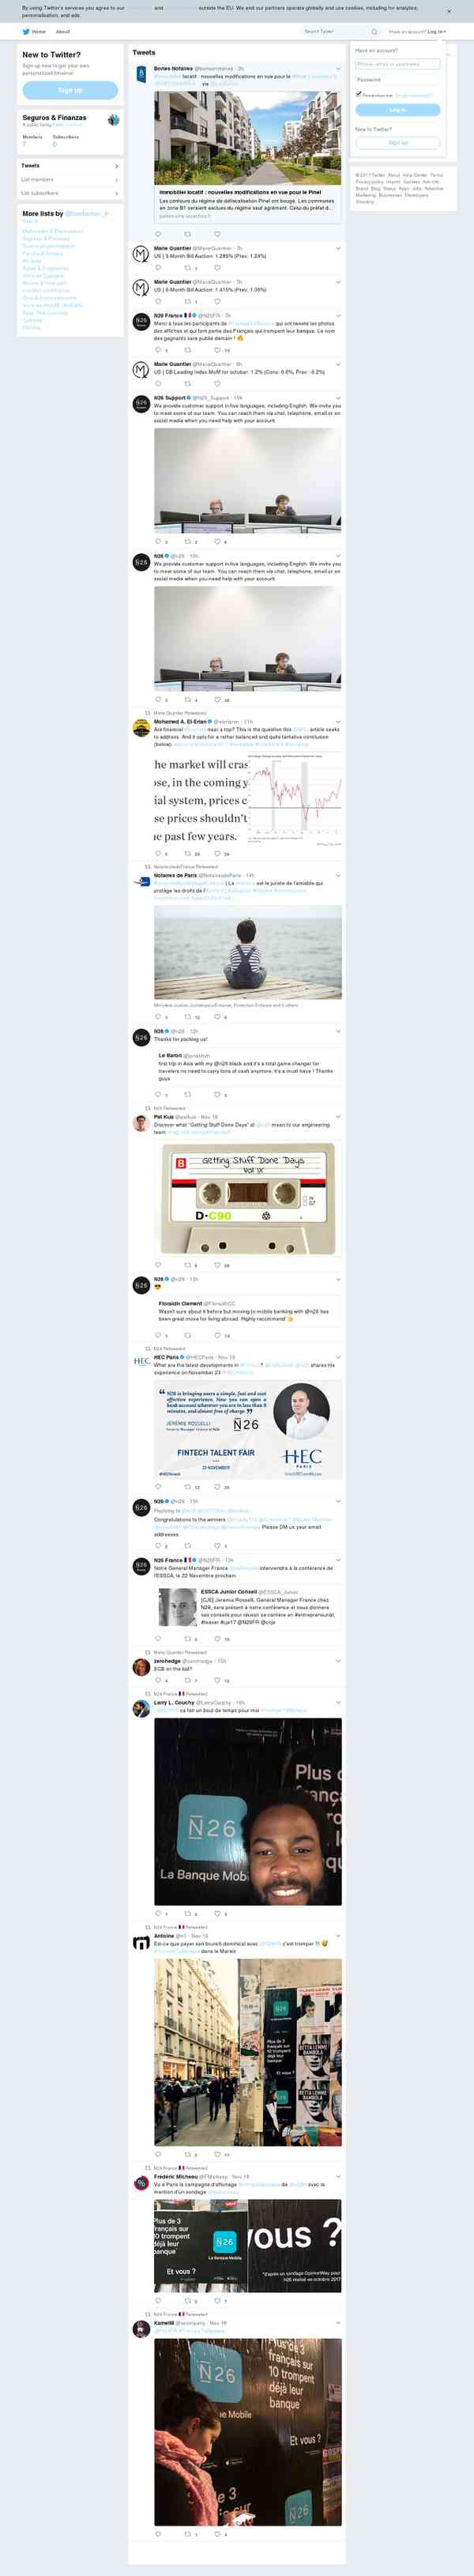 @lambertov_fr/Seguros & Finanzas sur Twitter